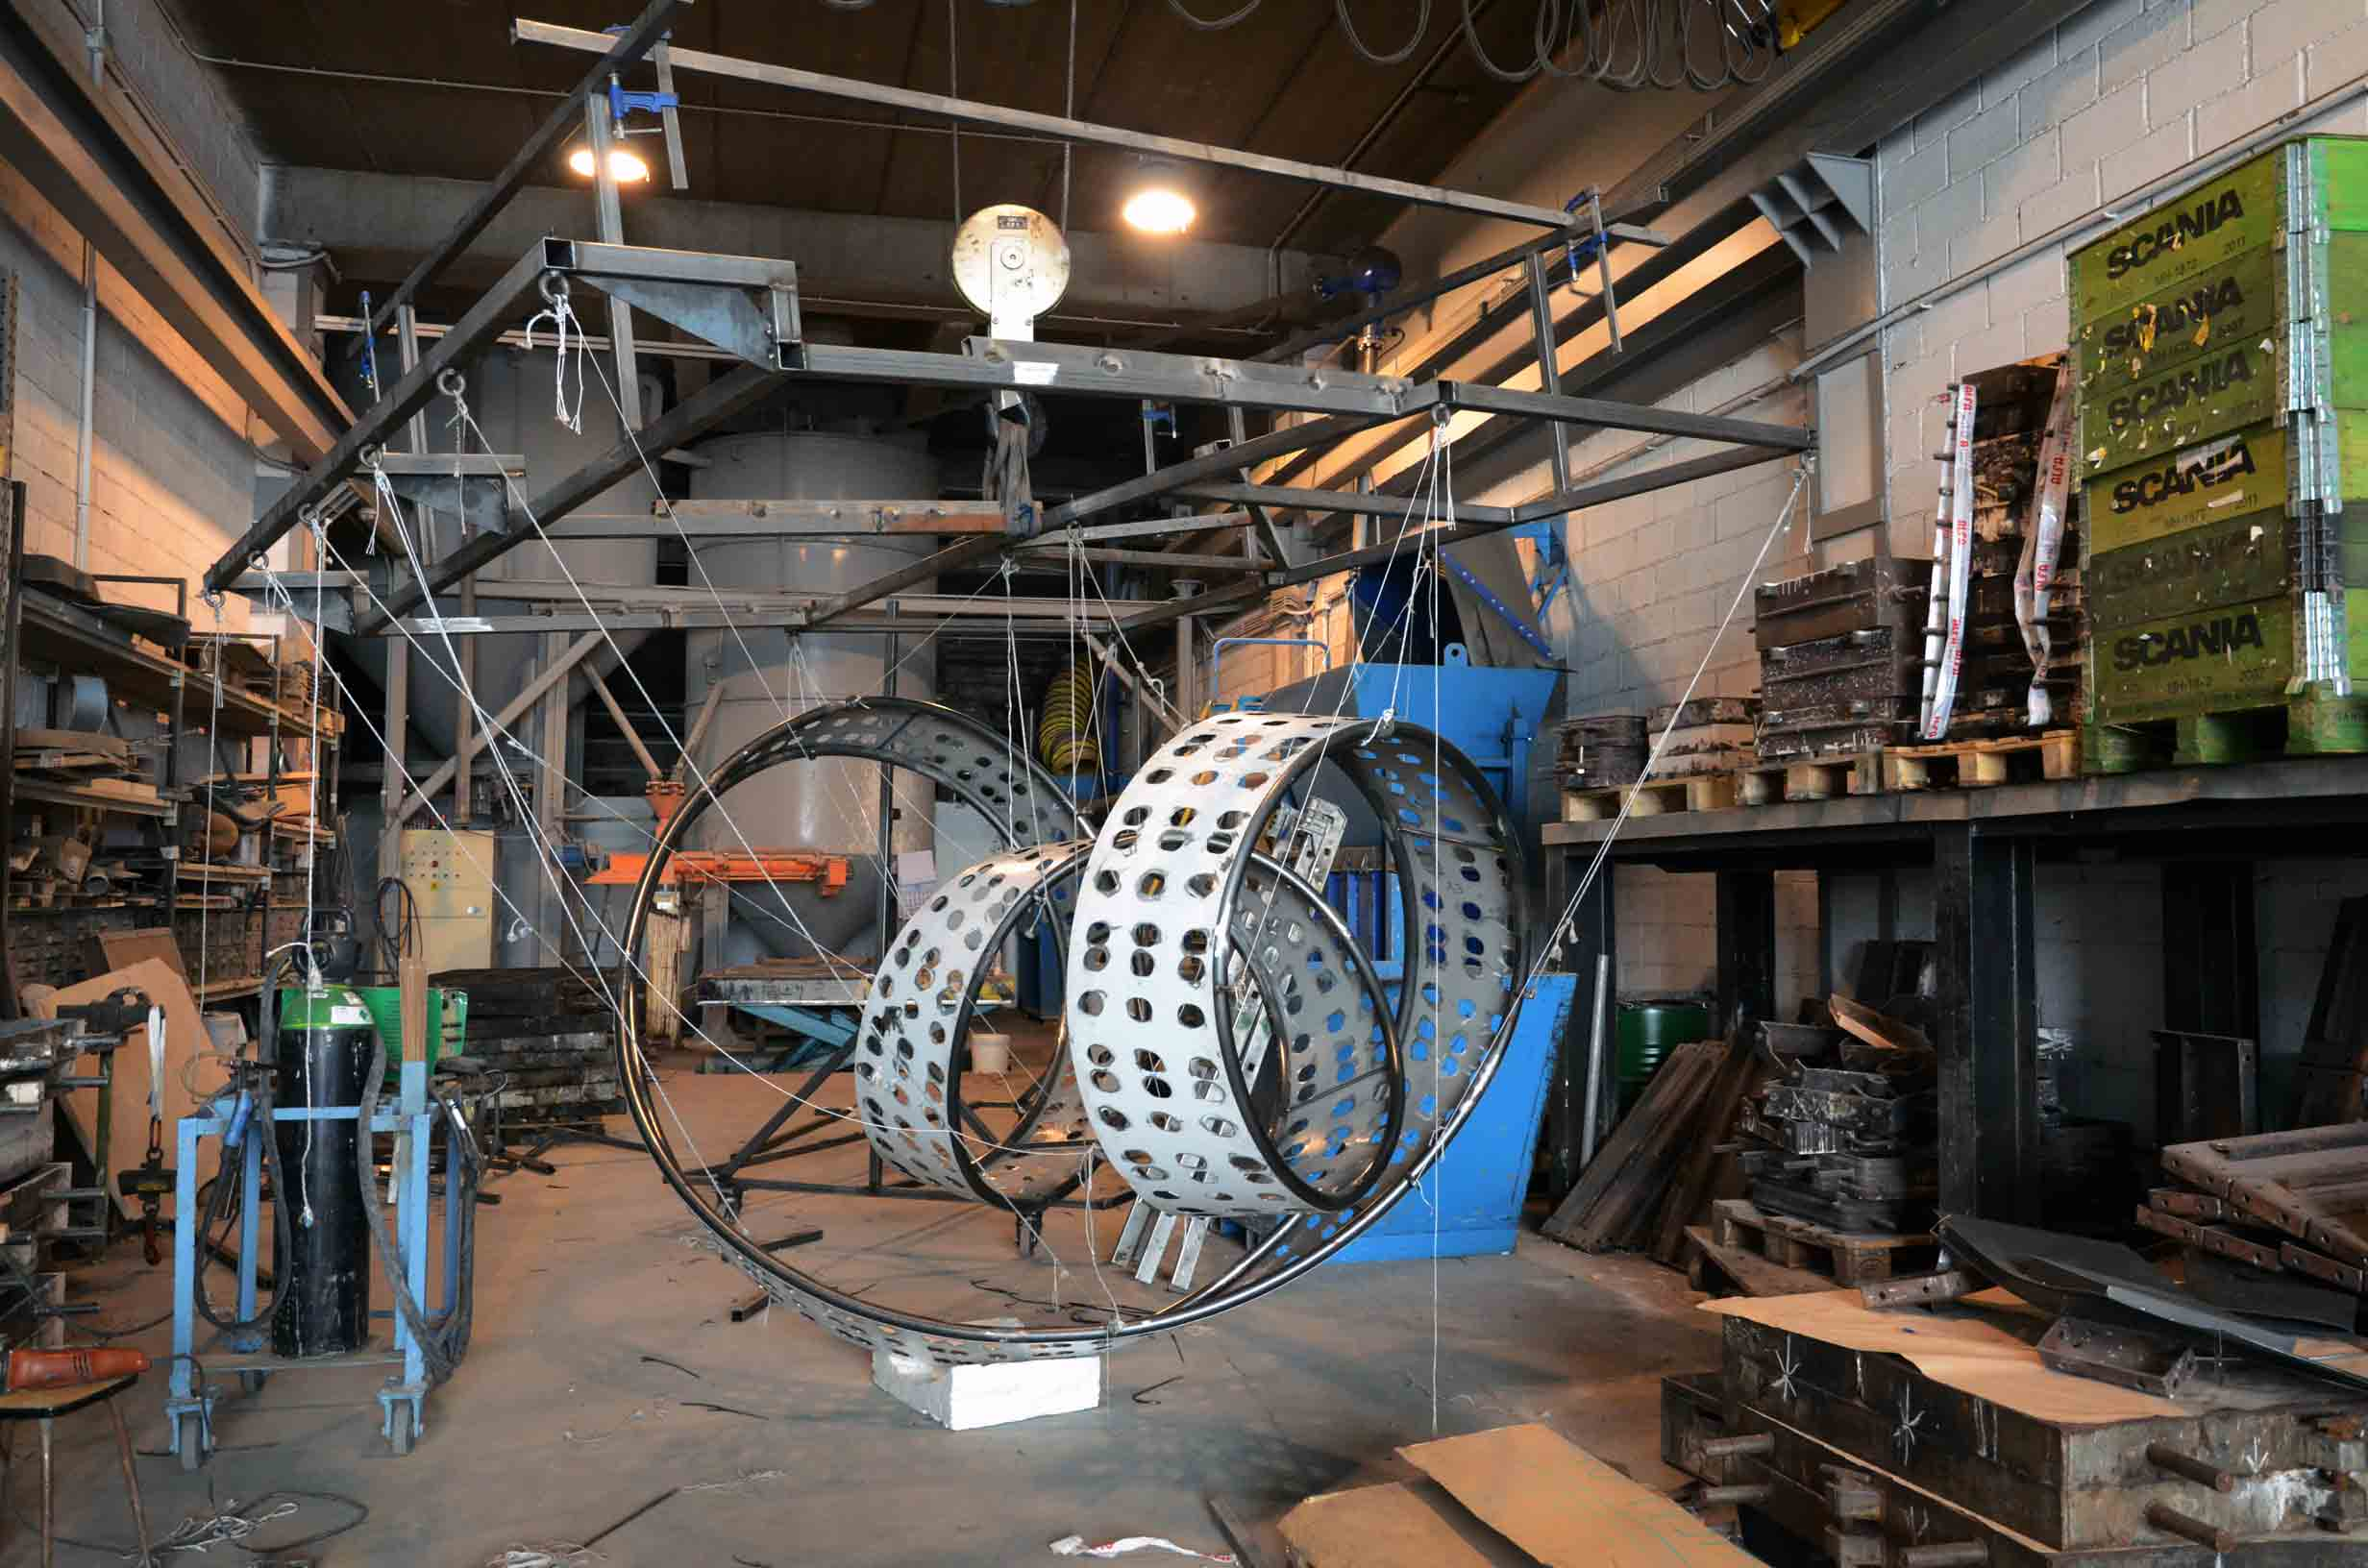 Helix Quantum of the Seas - ROYAL CARIBBEAN